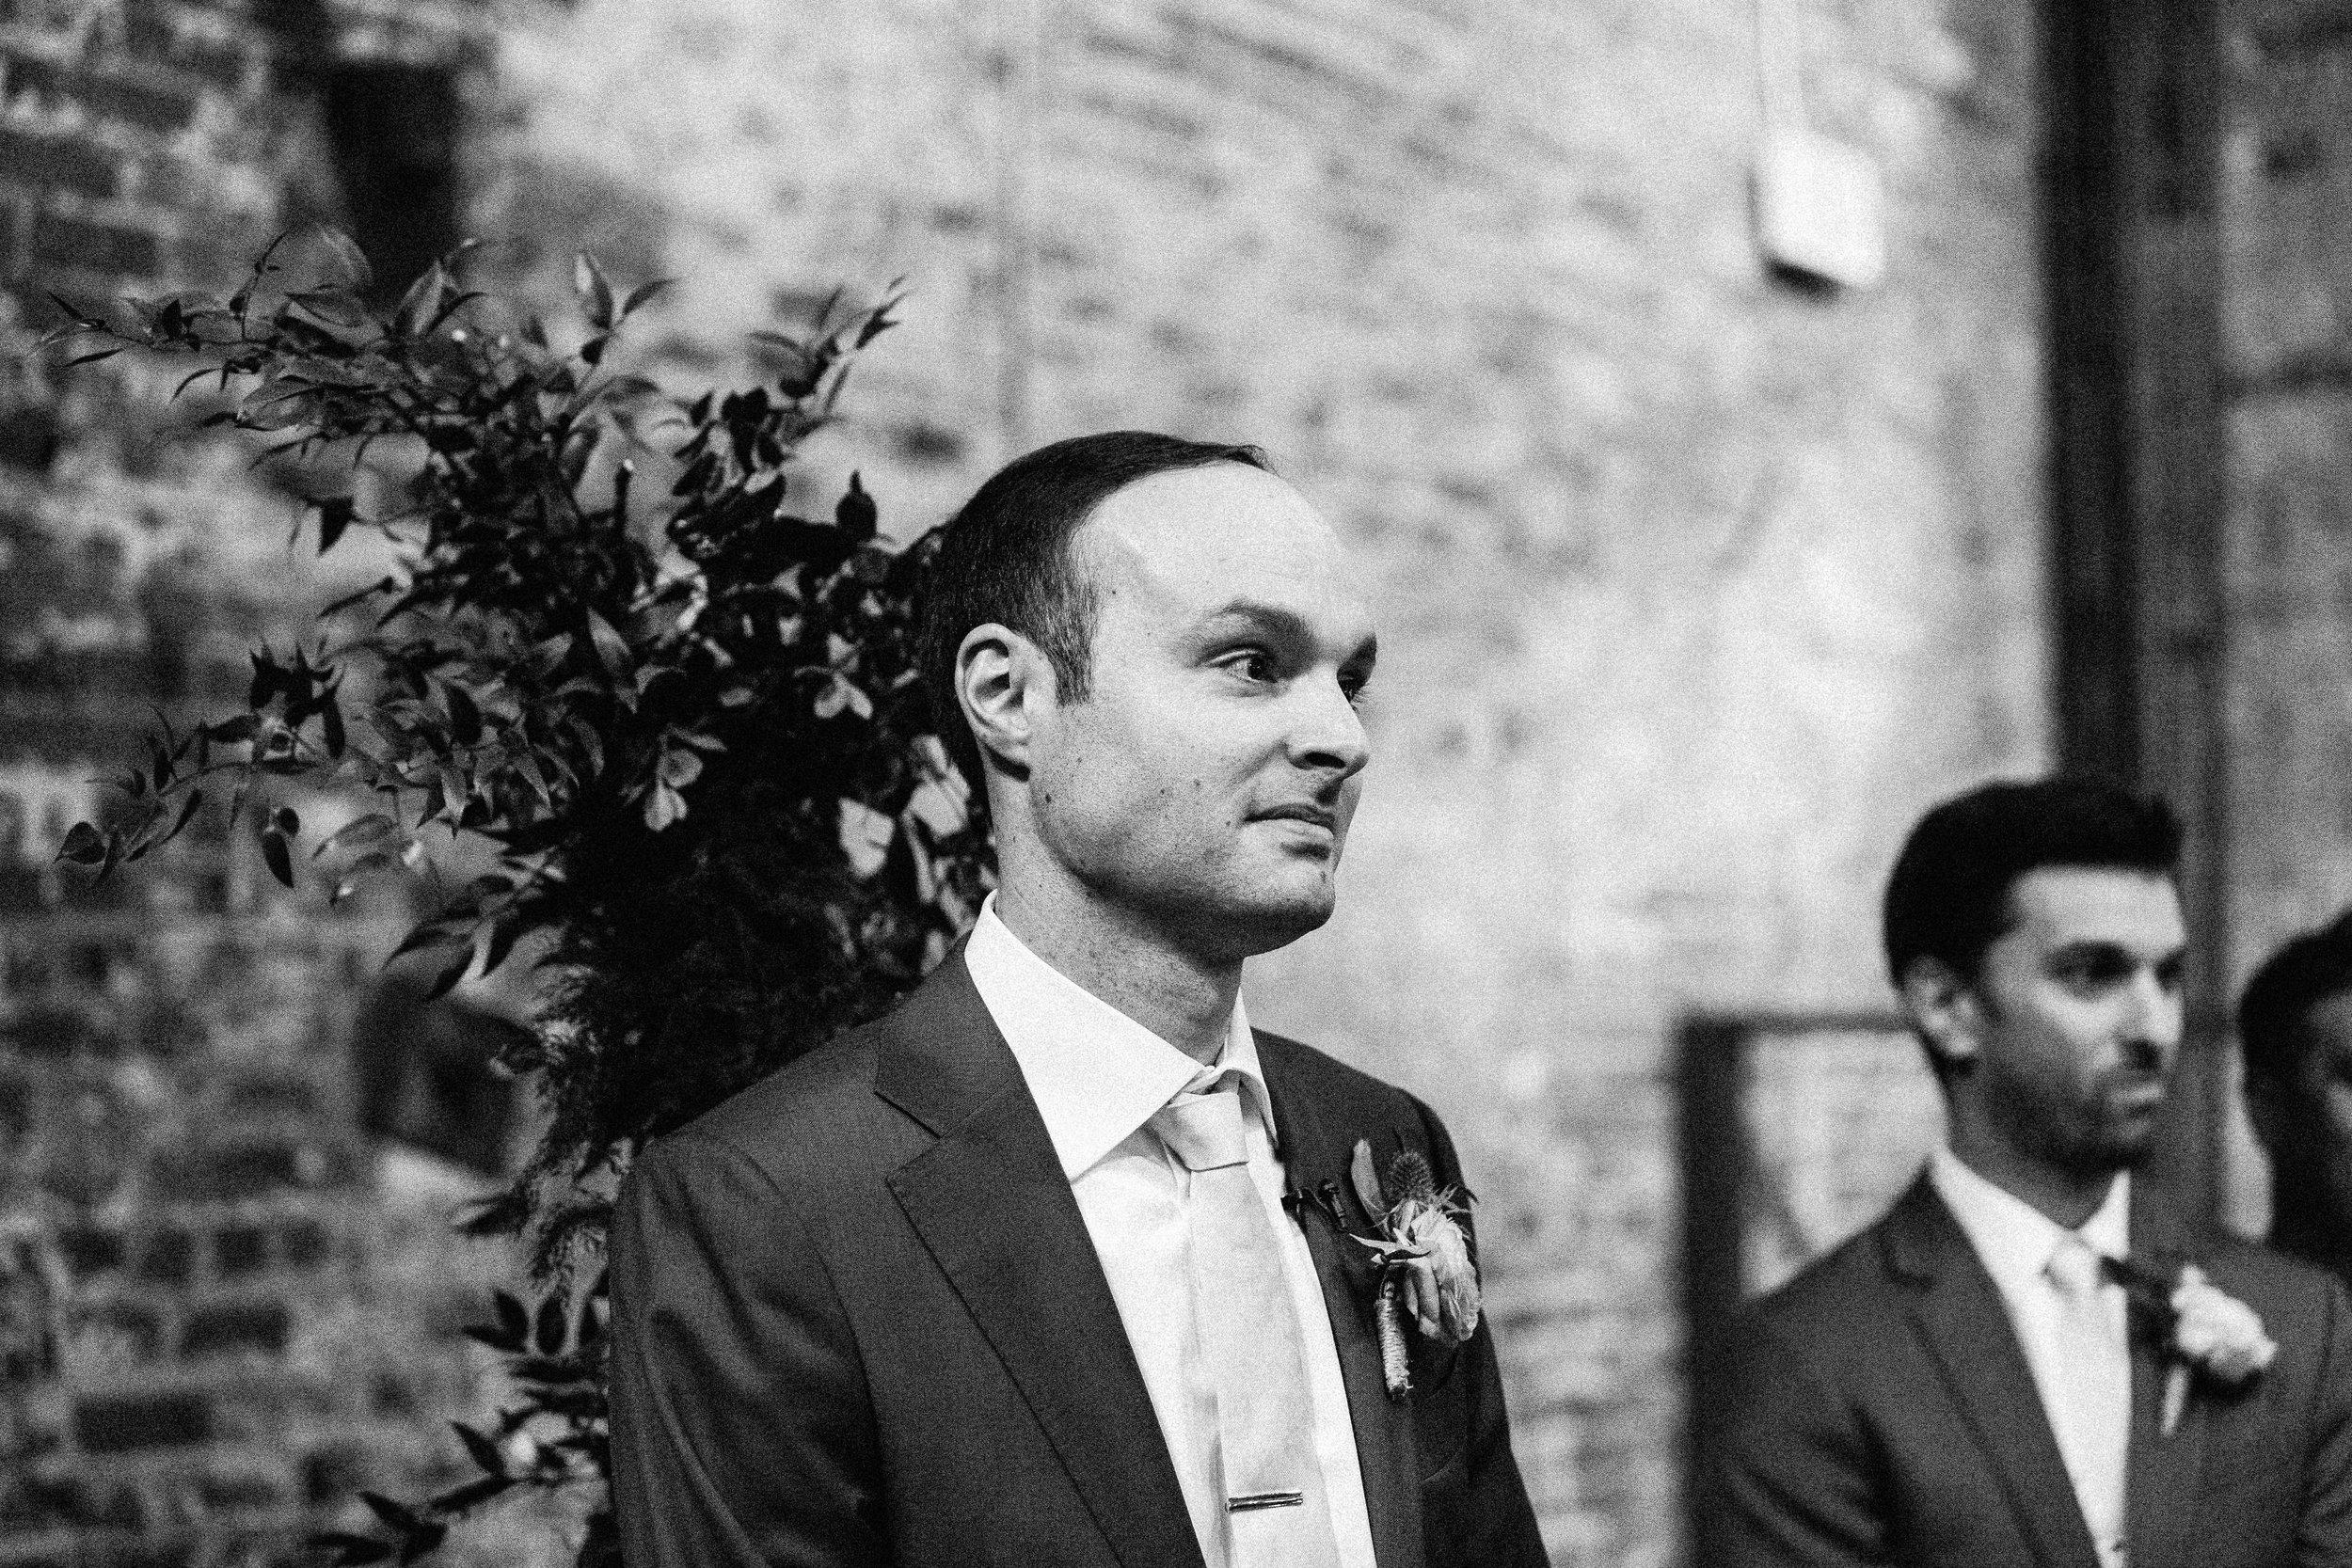 king_plow_atlanta_wedding_art_gallery_modern_lifestyle_documentary_1470.jpg